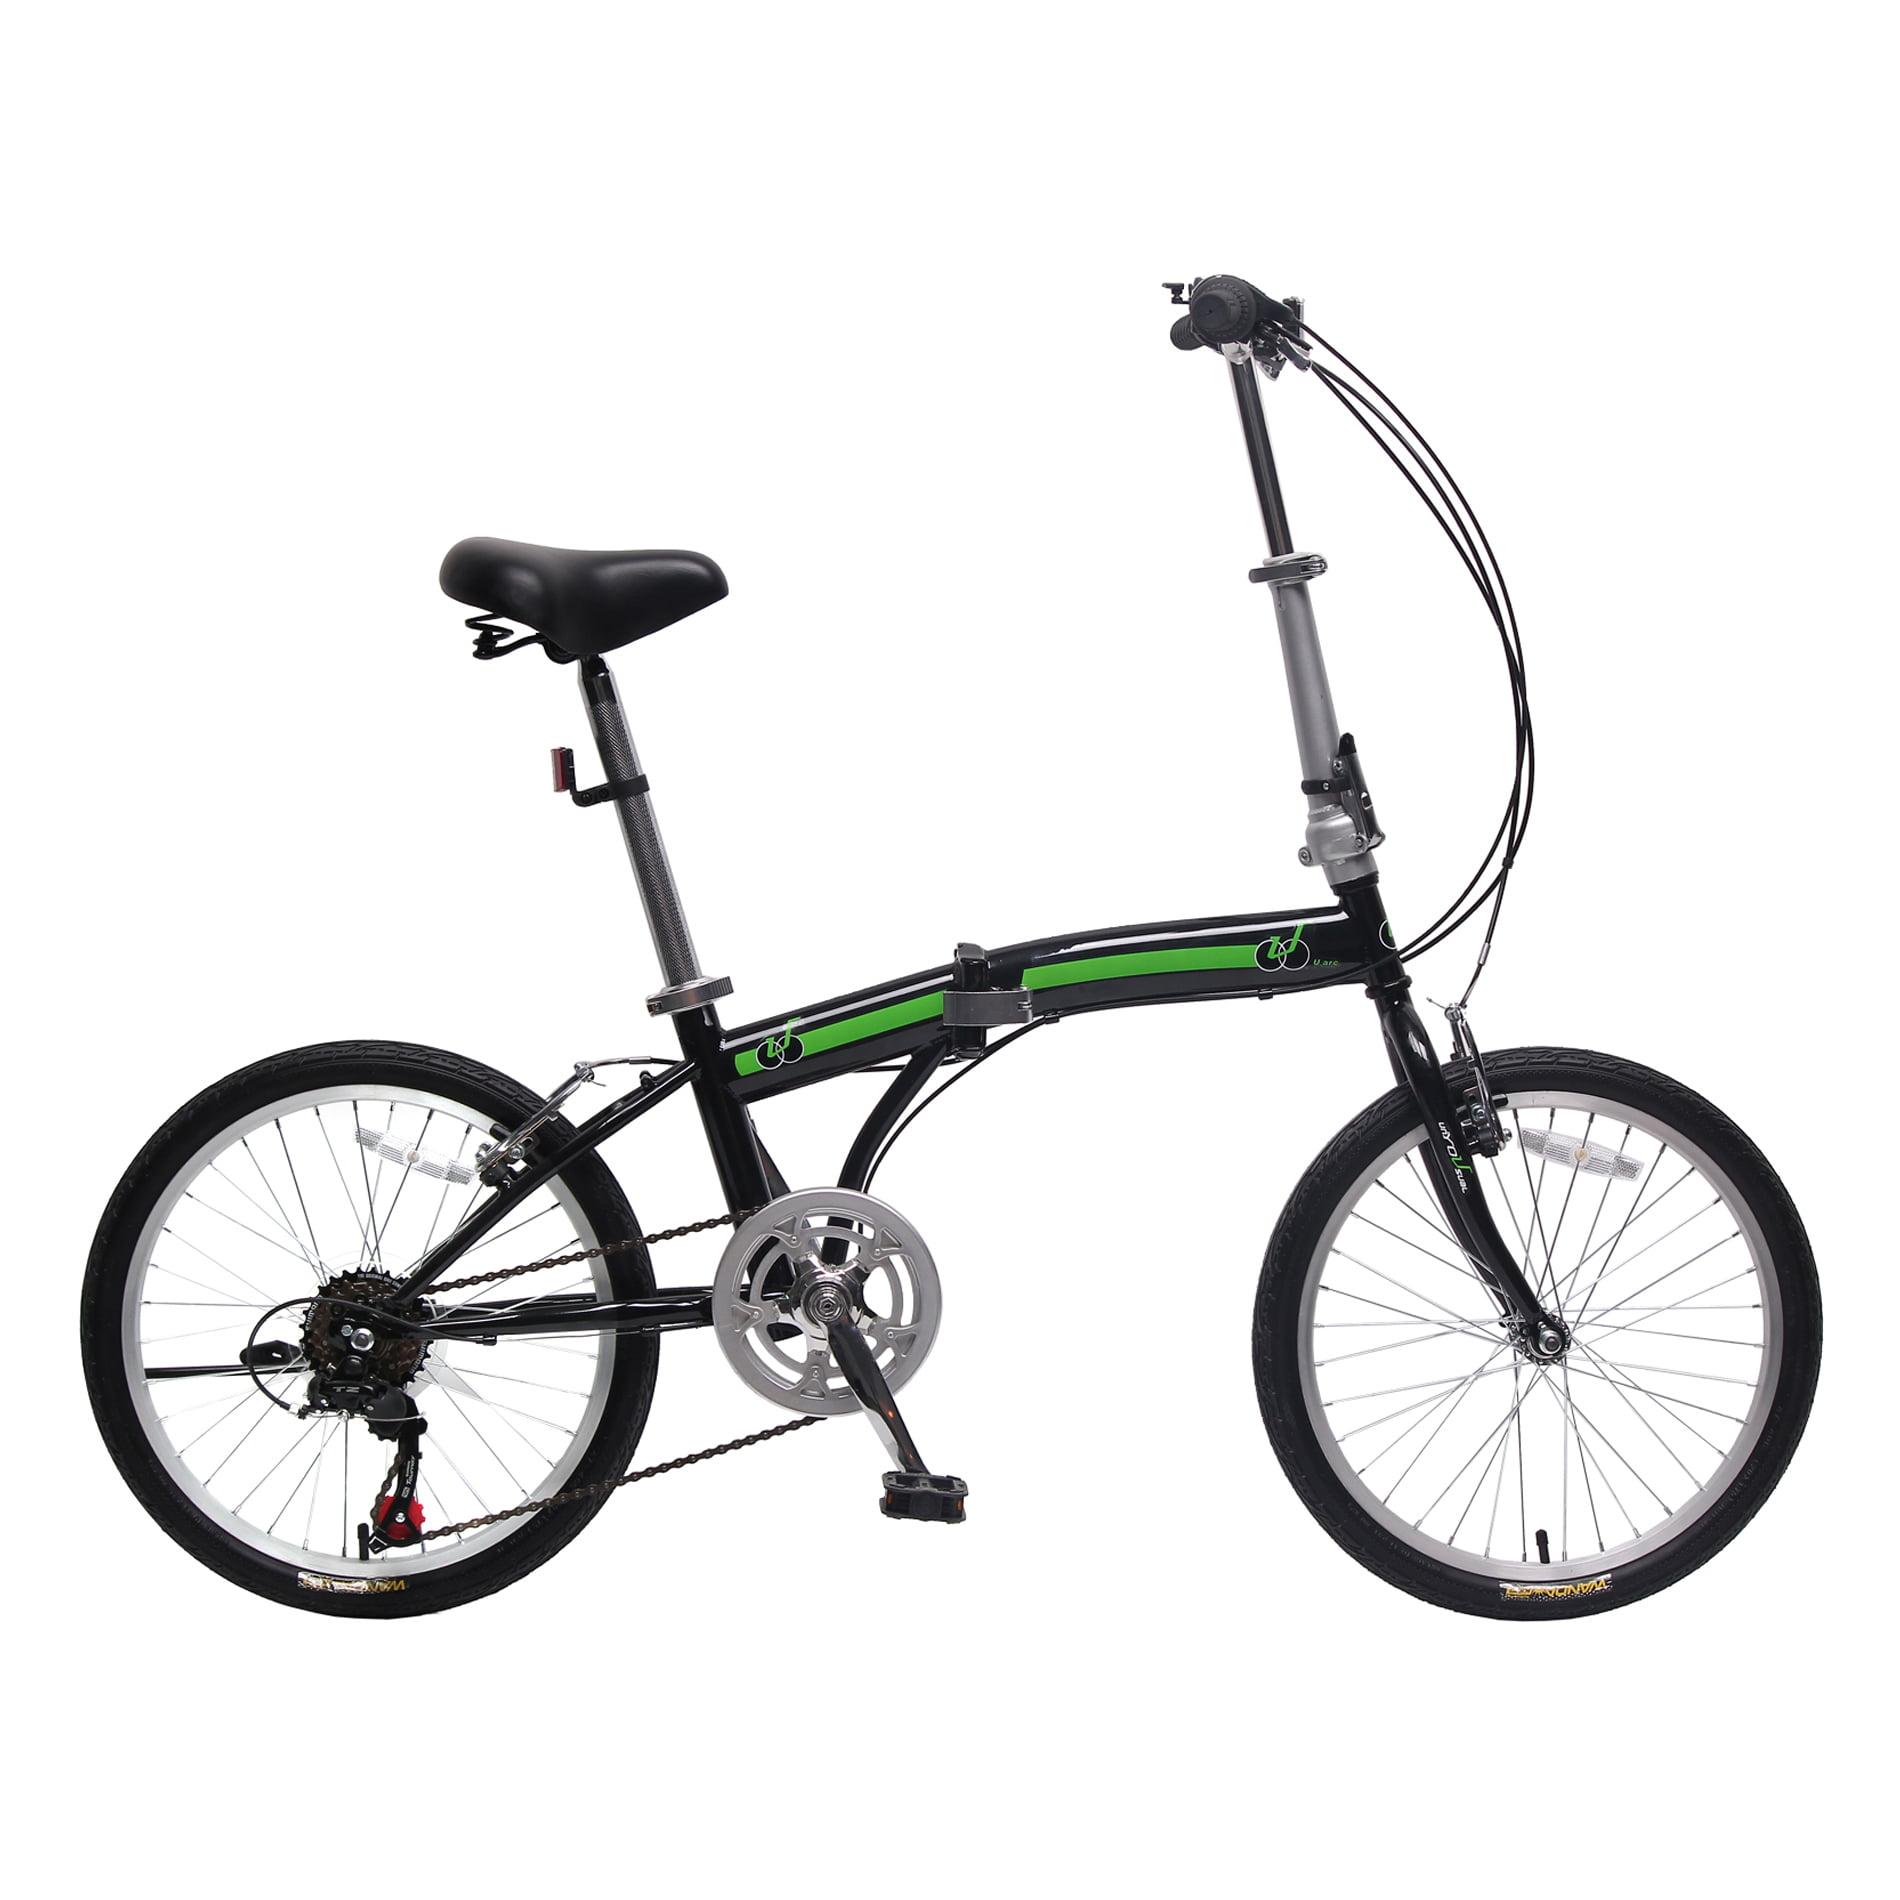 Unyousual U Arc 20 Inch 6 Speed City Folding Compact Bike Foldable